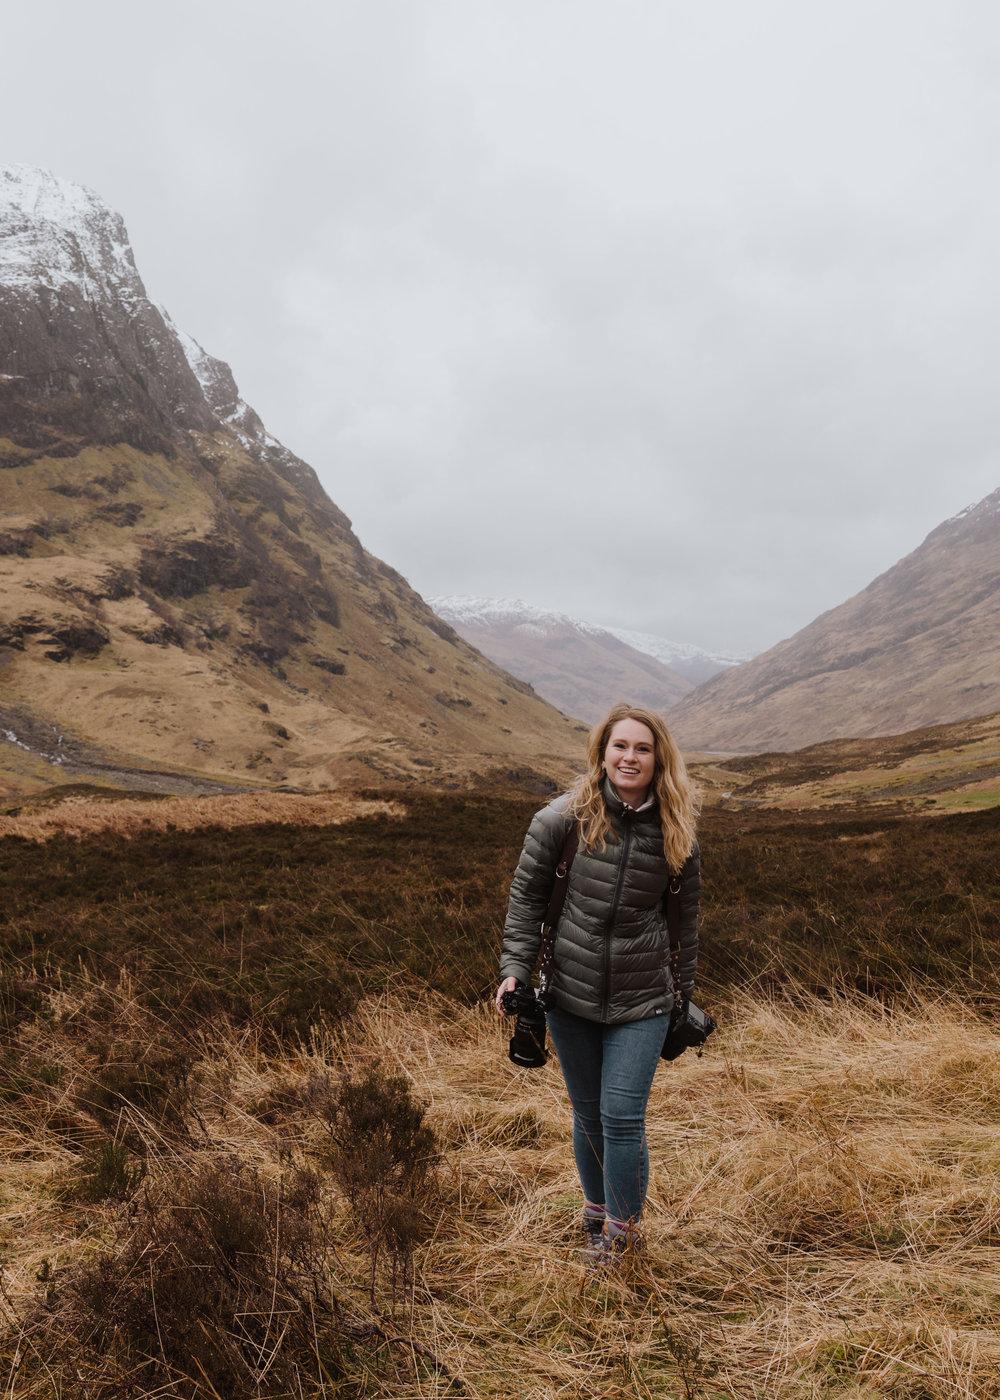 ScotlandHeadshot-1 vert.jpg